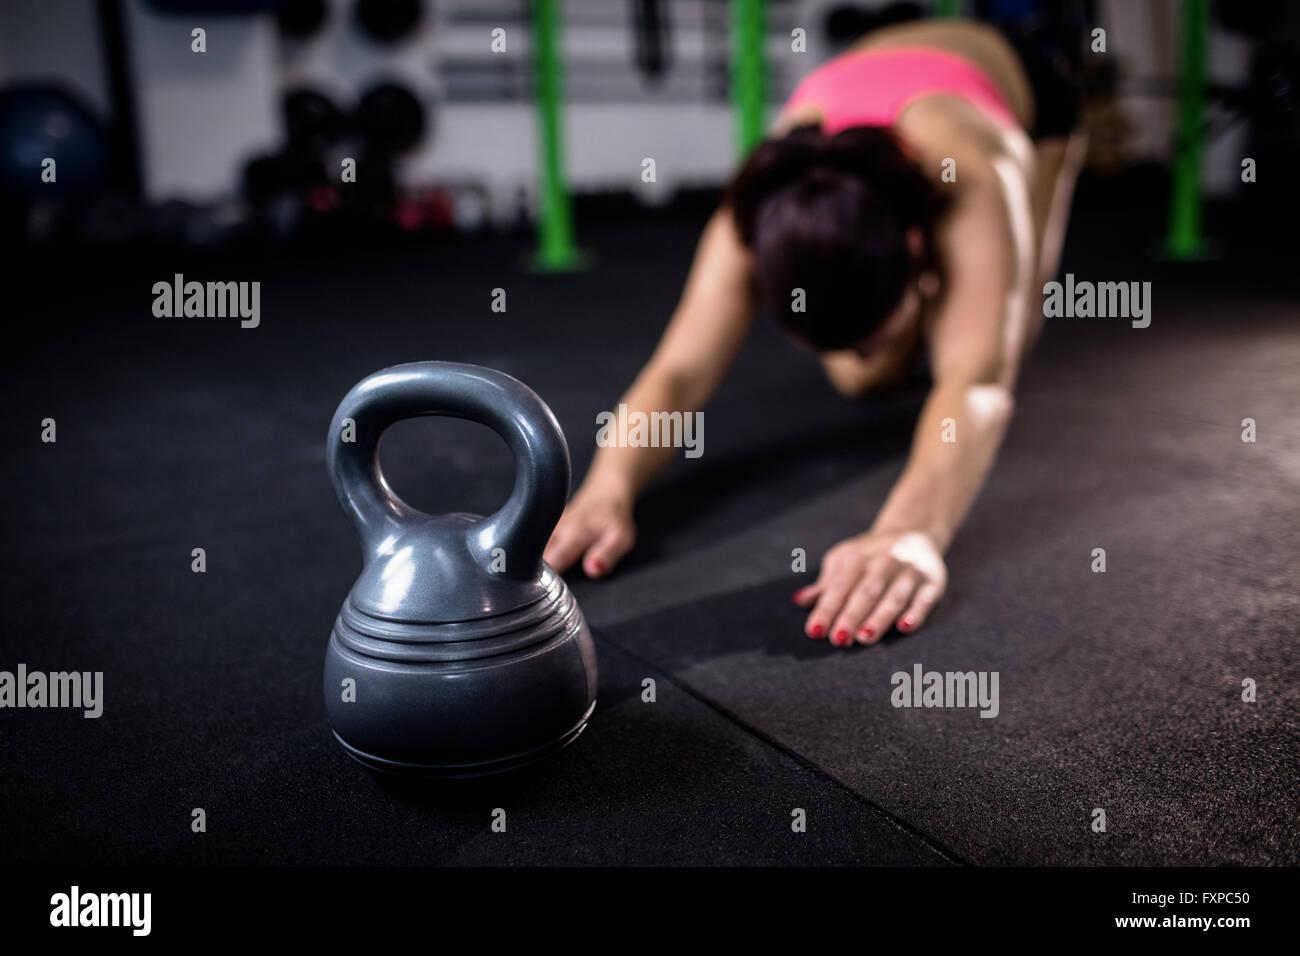 Black kettlebell in gym - Stock Image